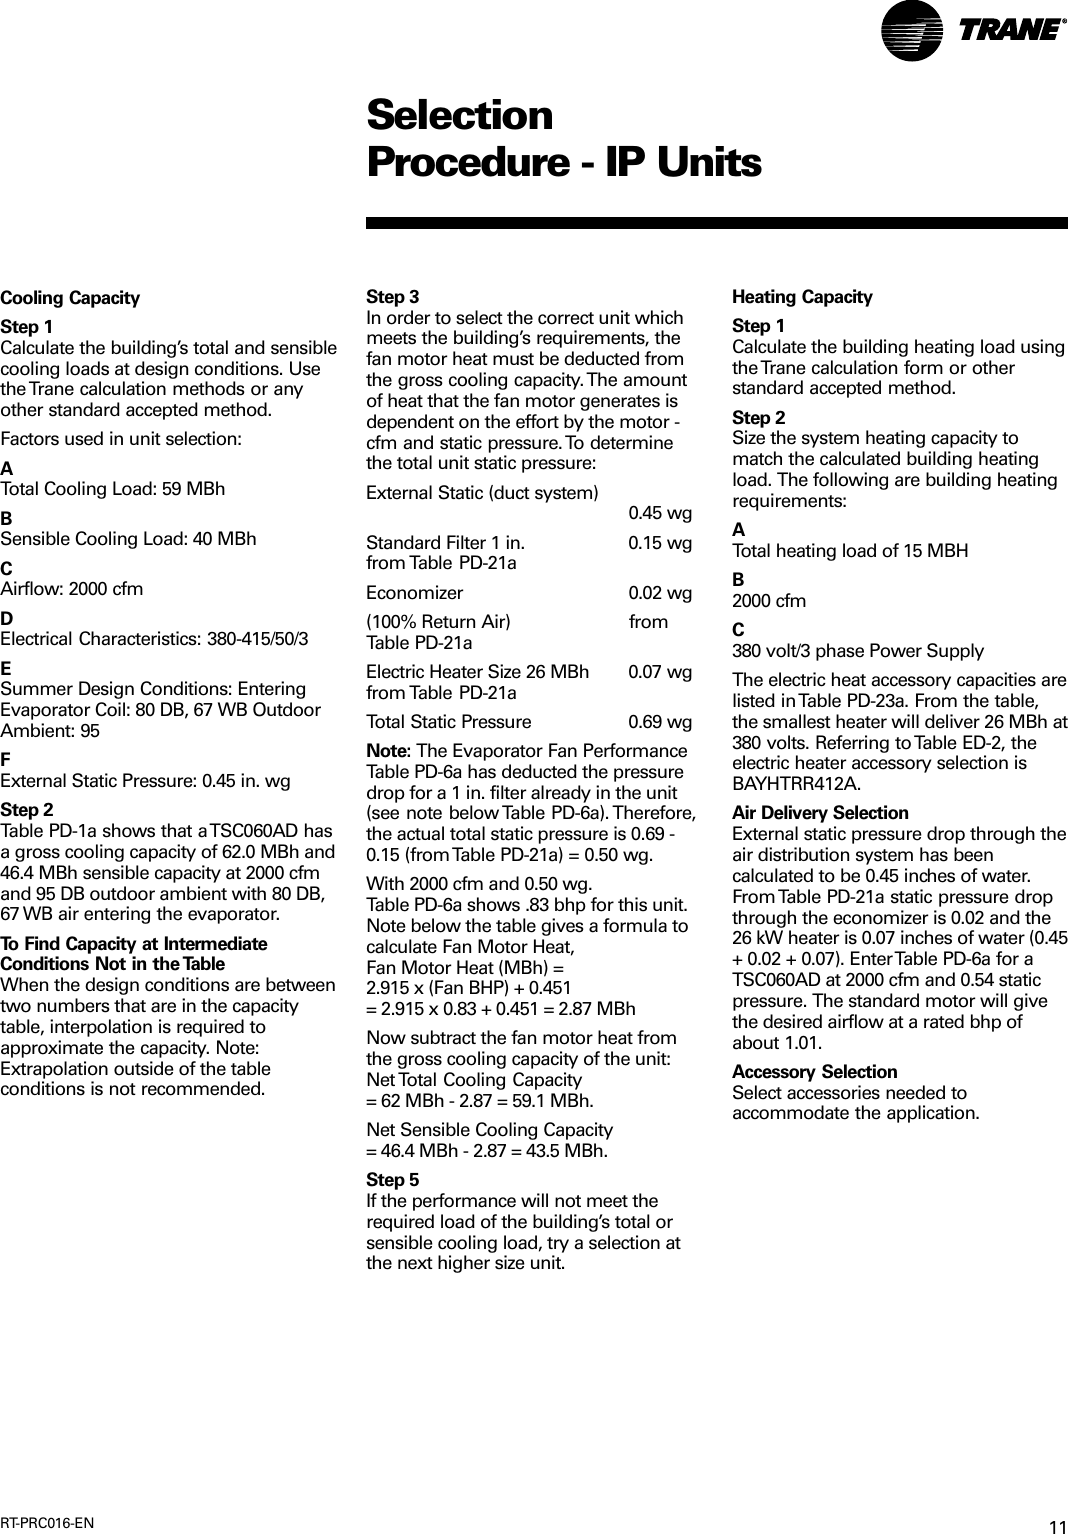 Trane Tsc060 120 Users Manual RT PRC016 EN 10/03